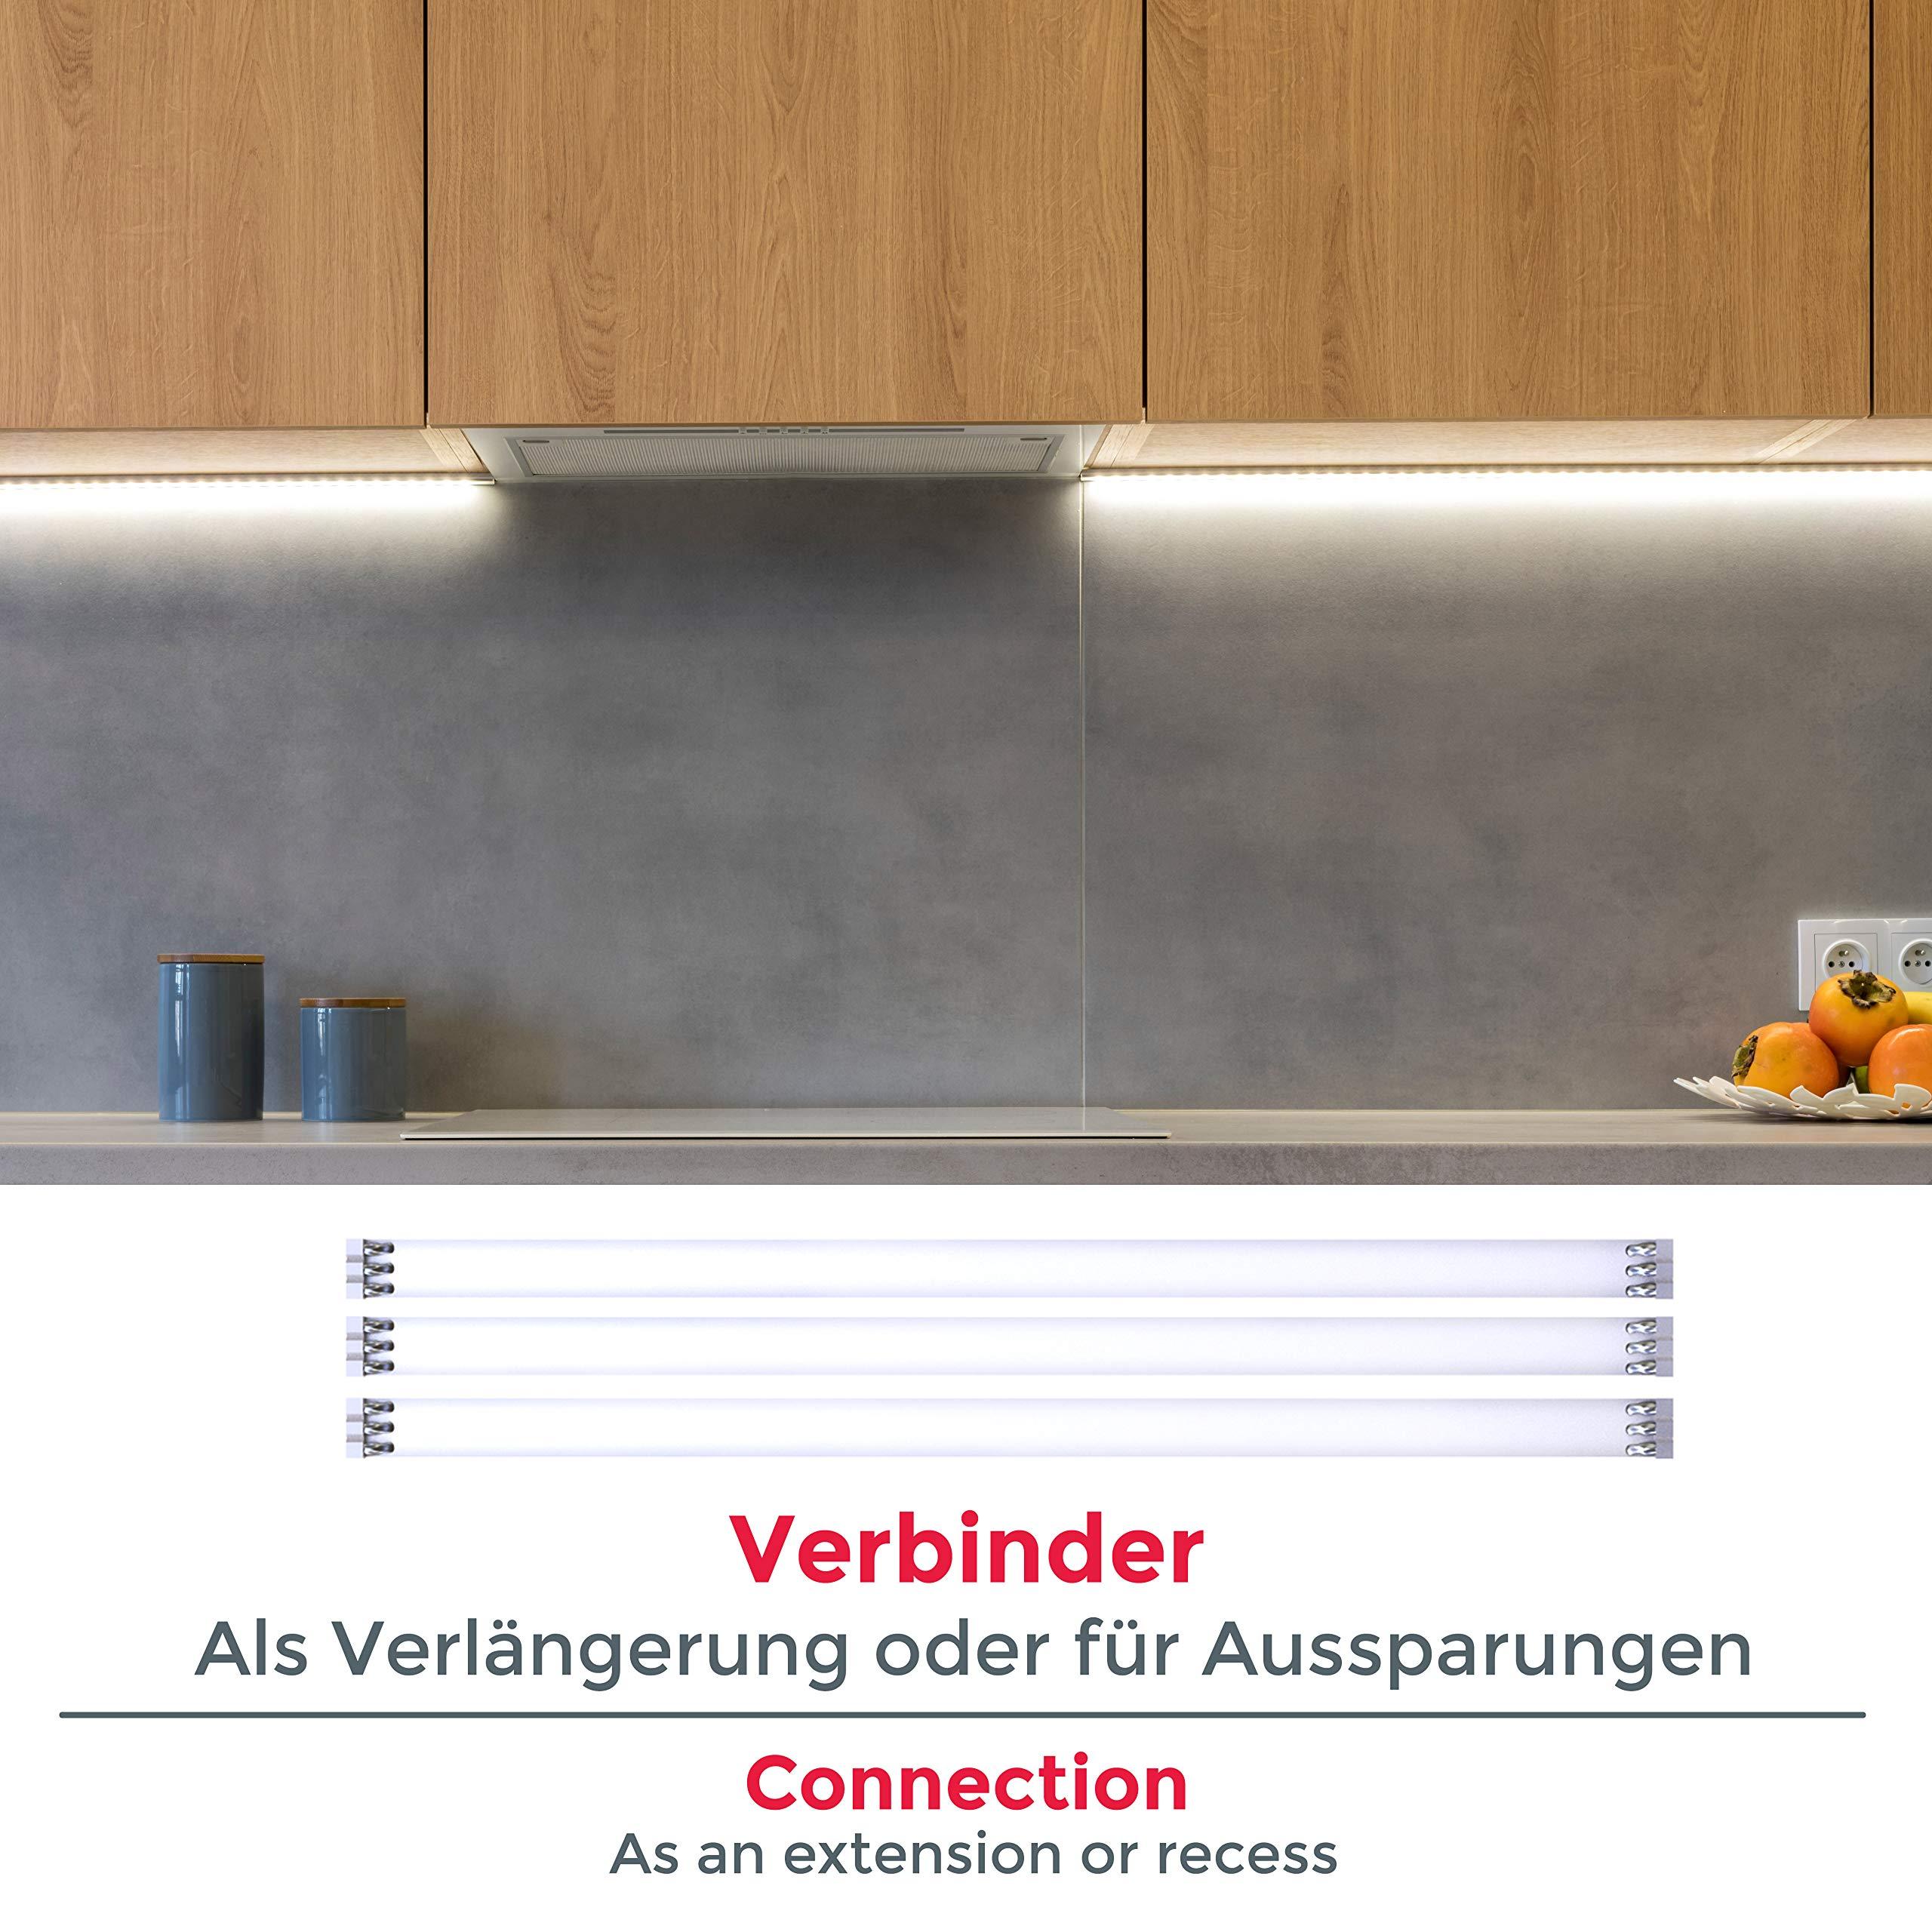 Striscia LED 2m, set di 4 pezzi da 50cm, Luce bianca naturale 4000k,  Include connettori, interruttore e spina europea, uso interno,  Accorciabili, ...